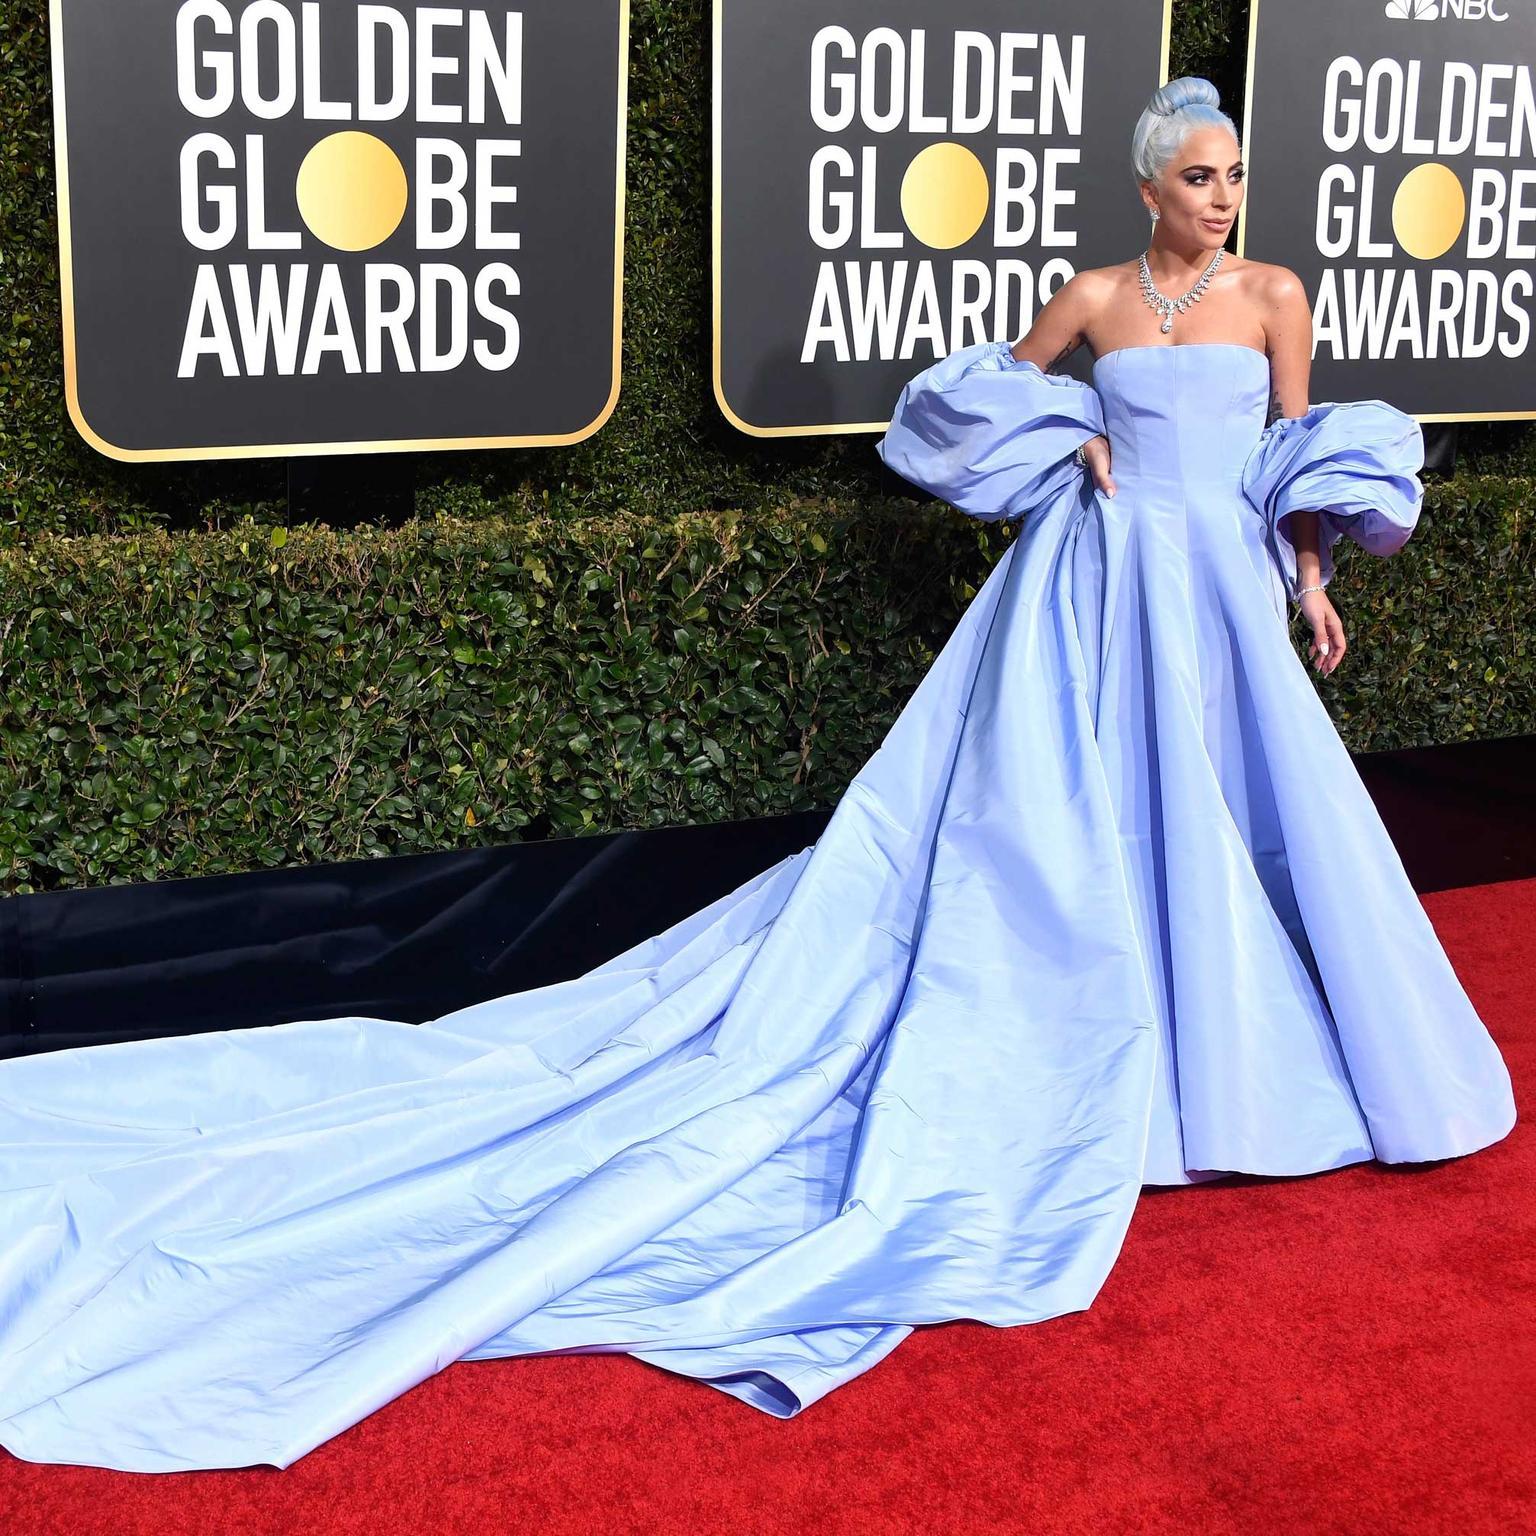 Lady Gaga Tiffany diamonds Golden Globes 2019